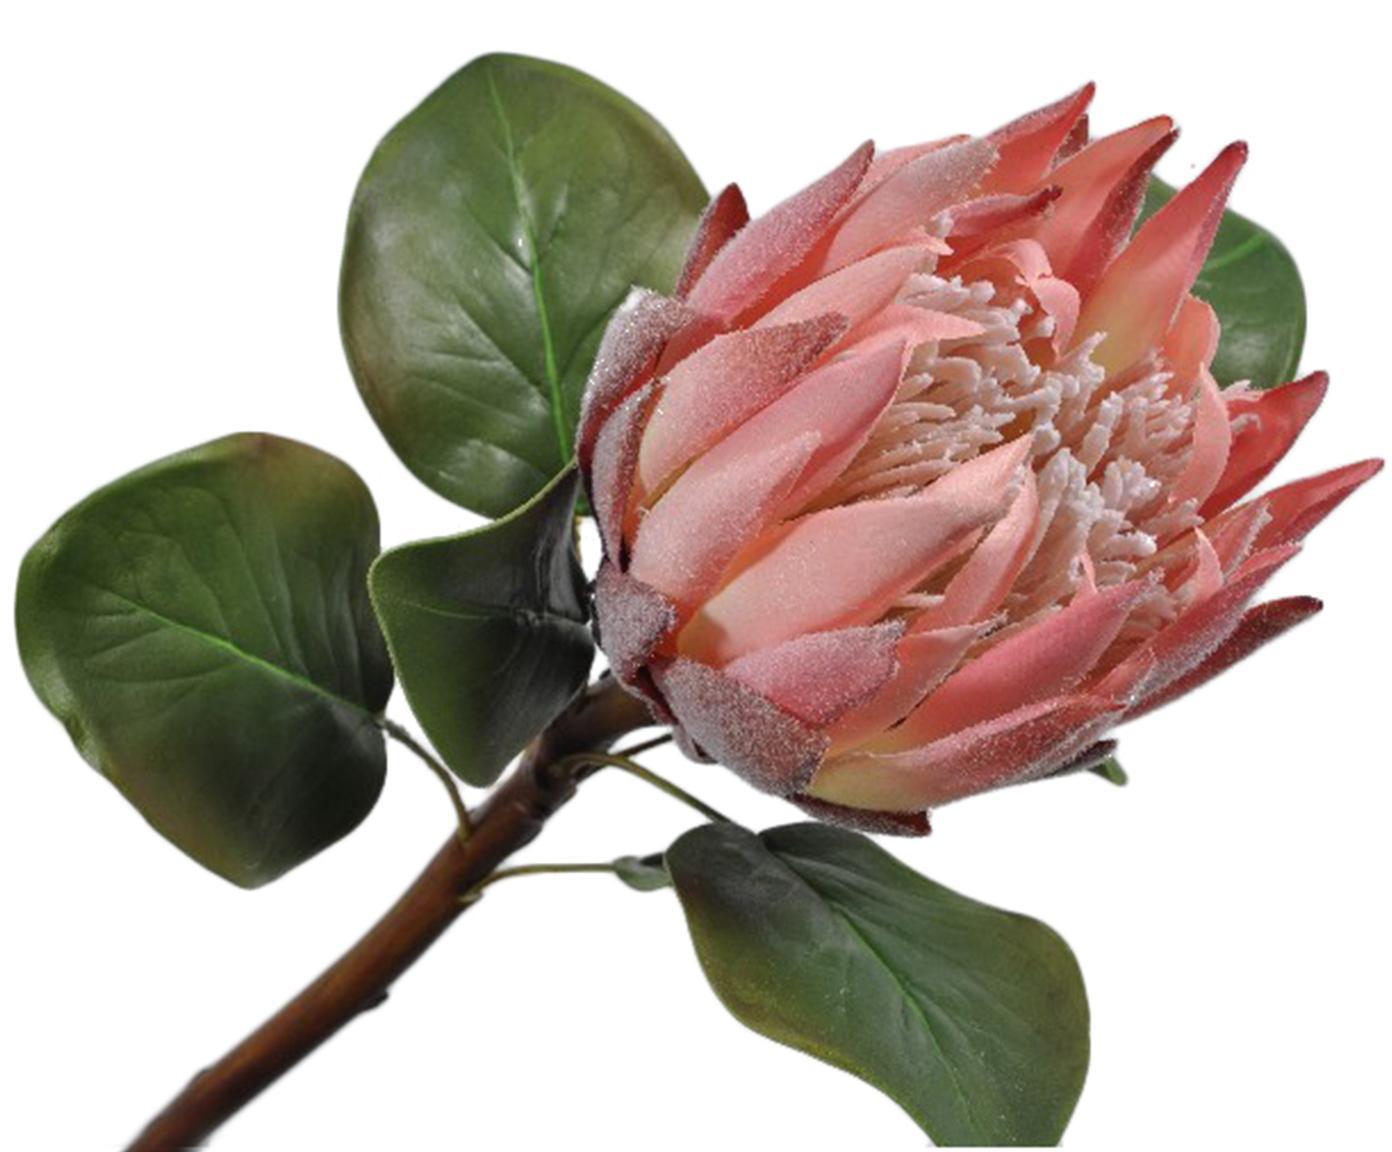 Kunstbloem Sugarbush Zenia, Polyester, PCV, metaal, Groen, roze, L 60 cm